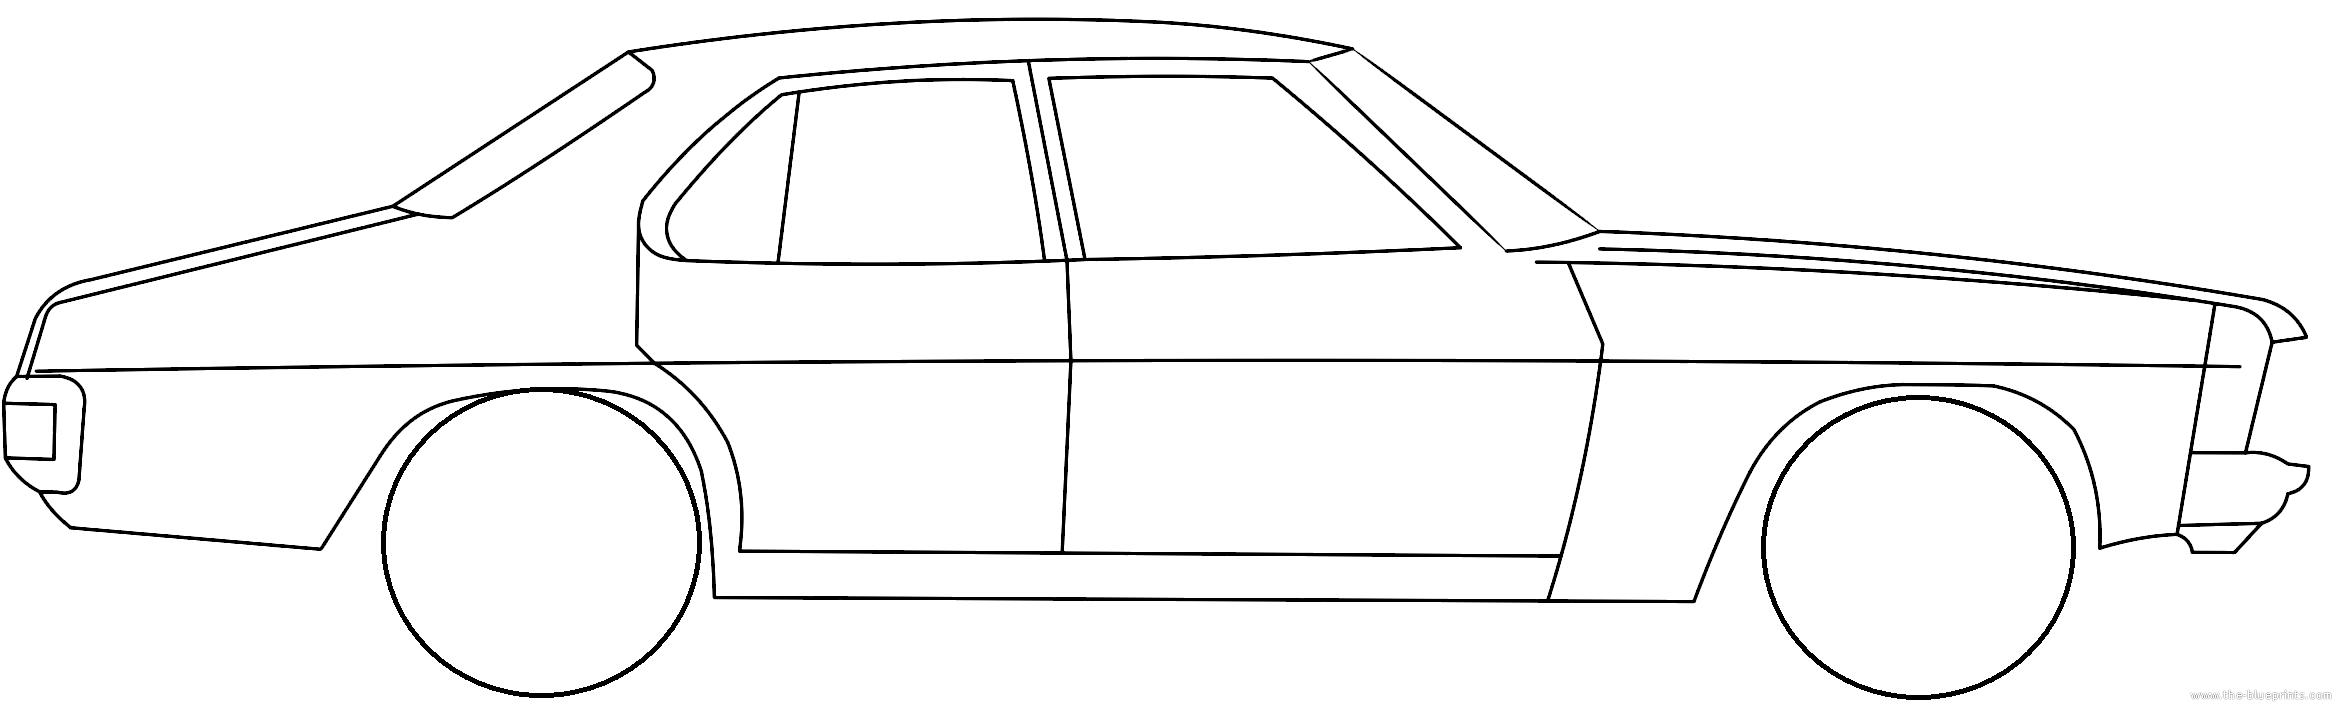 The Blueprints Com Blueprints Gt Cars Gt Holden Gt Holden